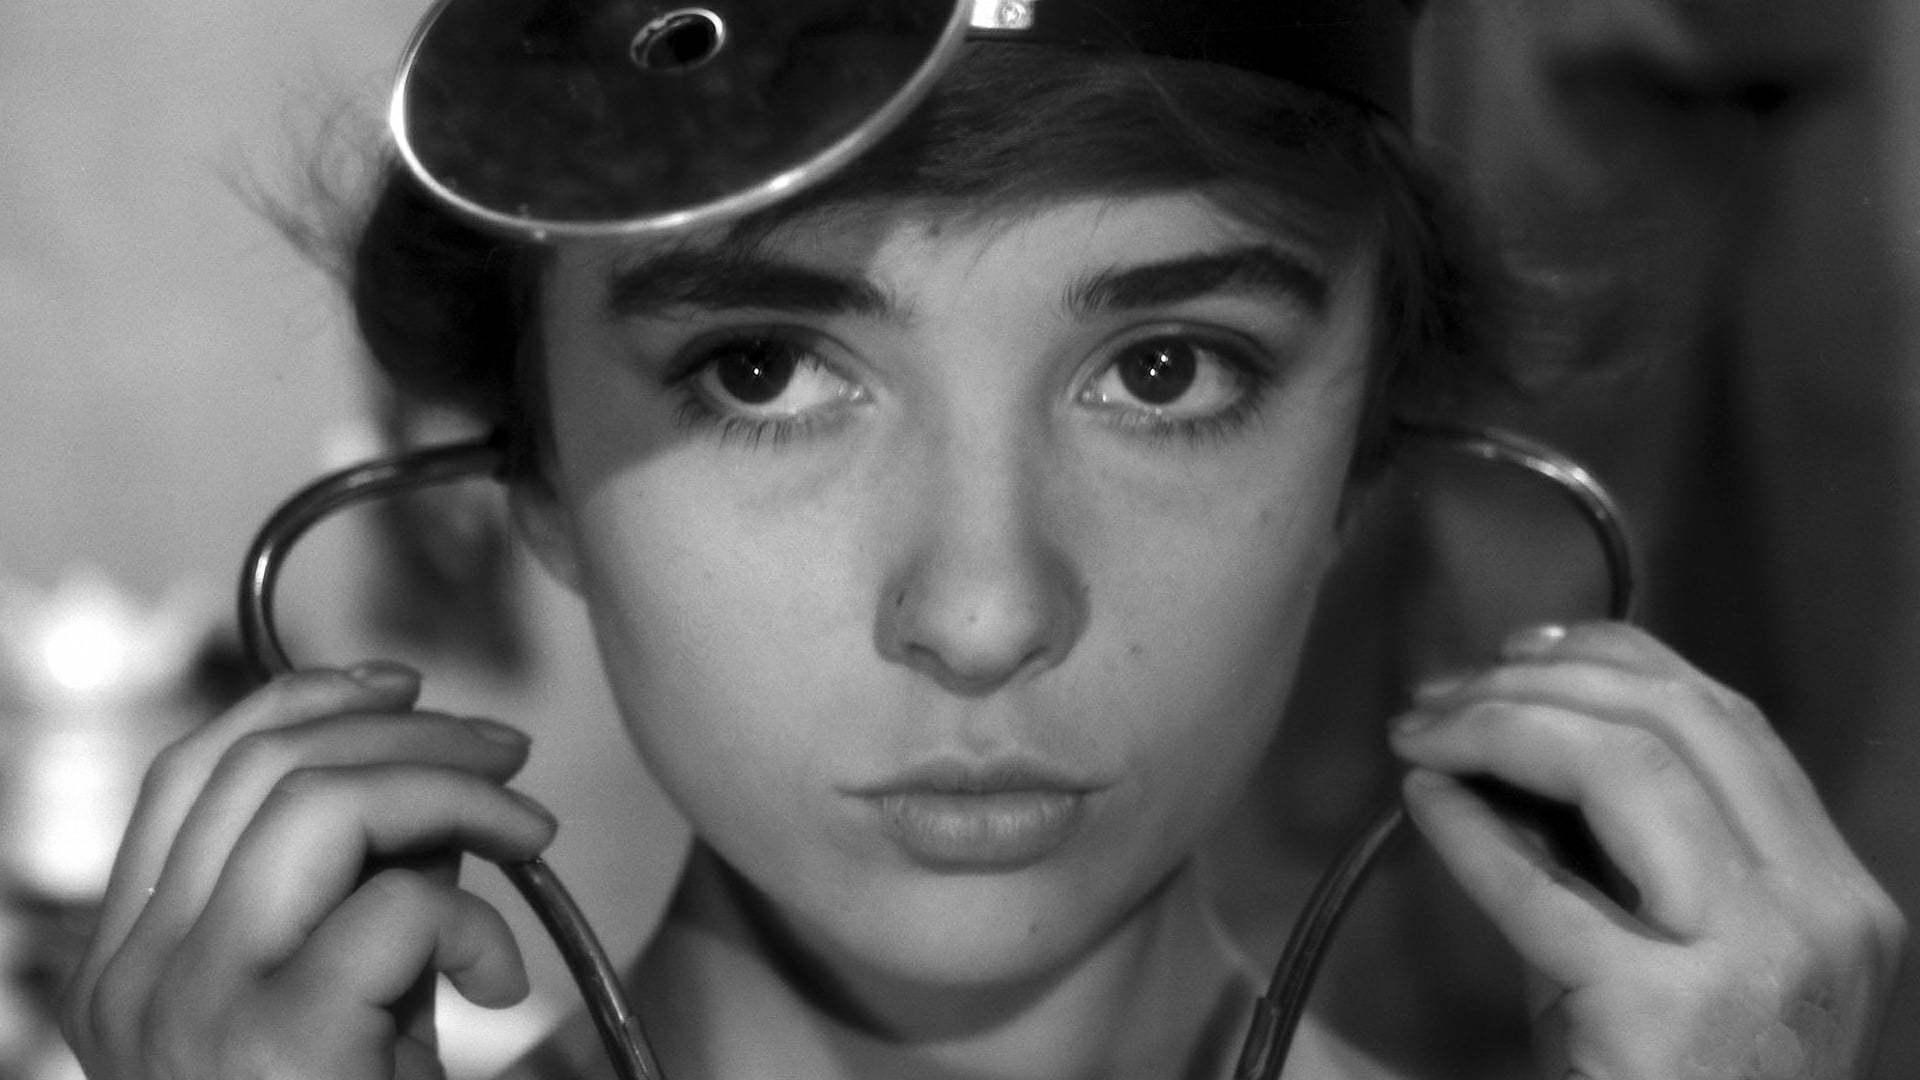 Кадры из фильма Невинные чародеи Niewinni czarodzieje 1960